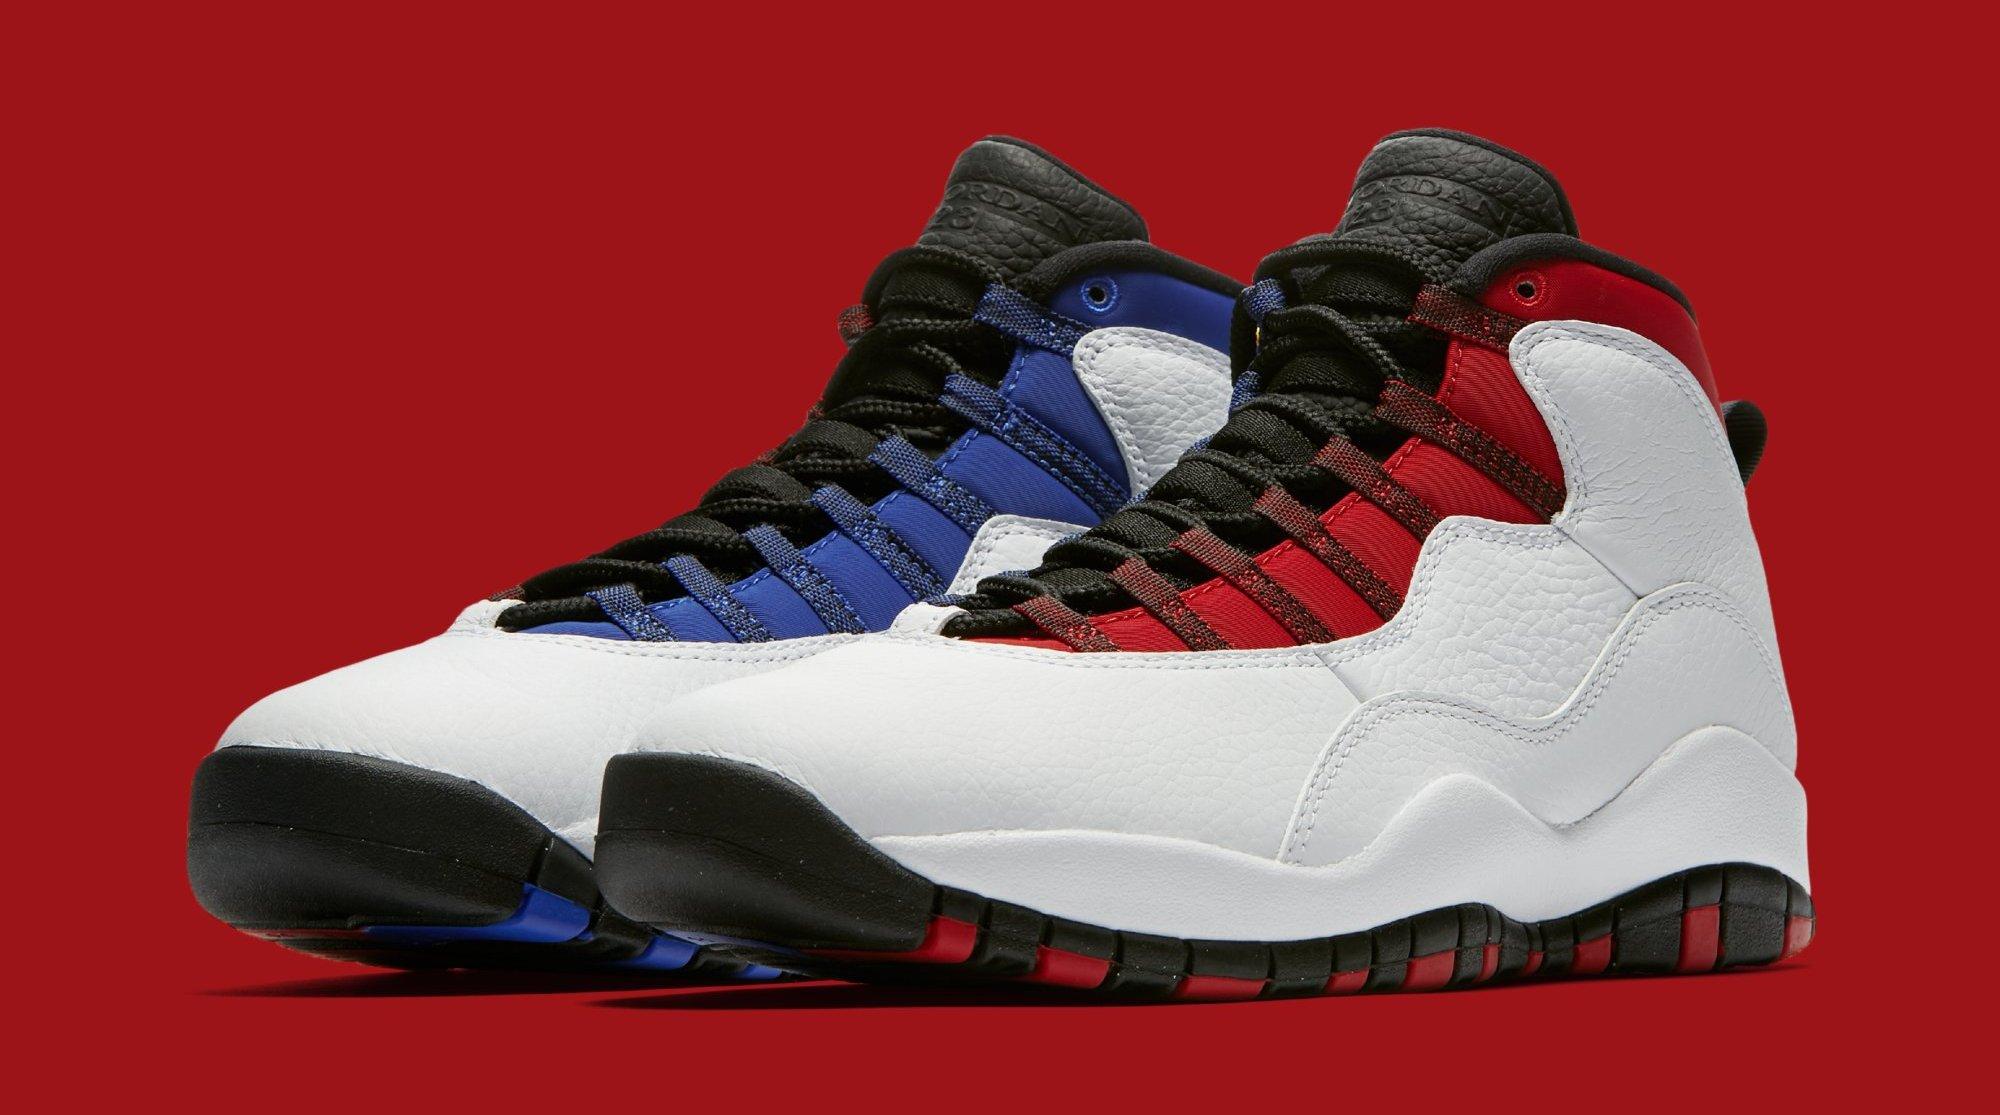 sports shoes 86332 43091 Air Jordan 10 Russell Westbrook 'Class of 2006' 310805-160 ...